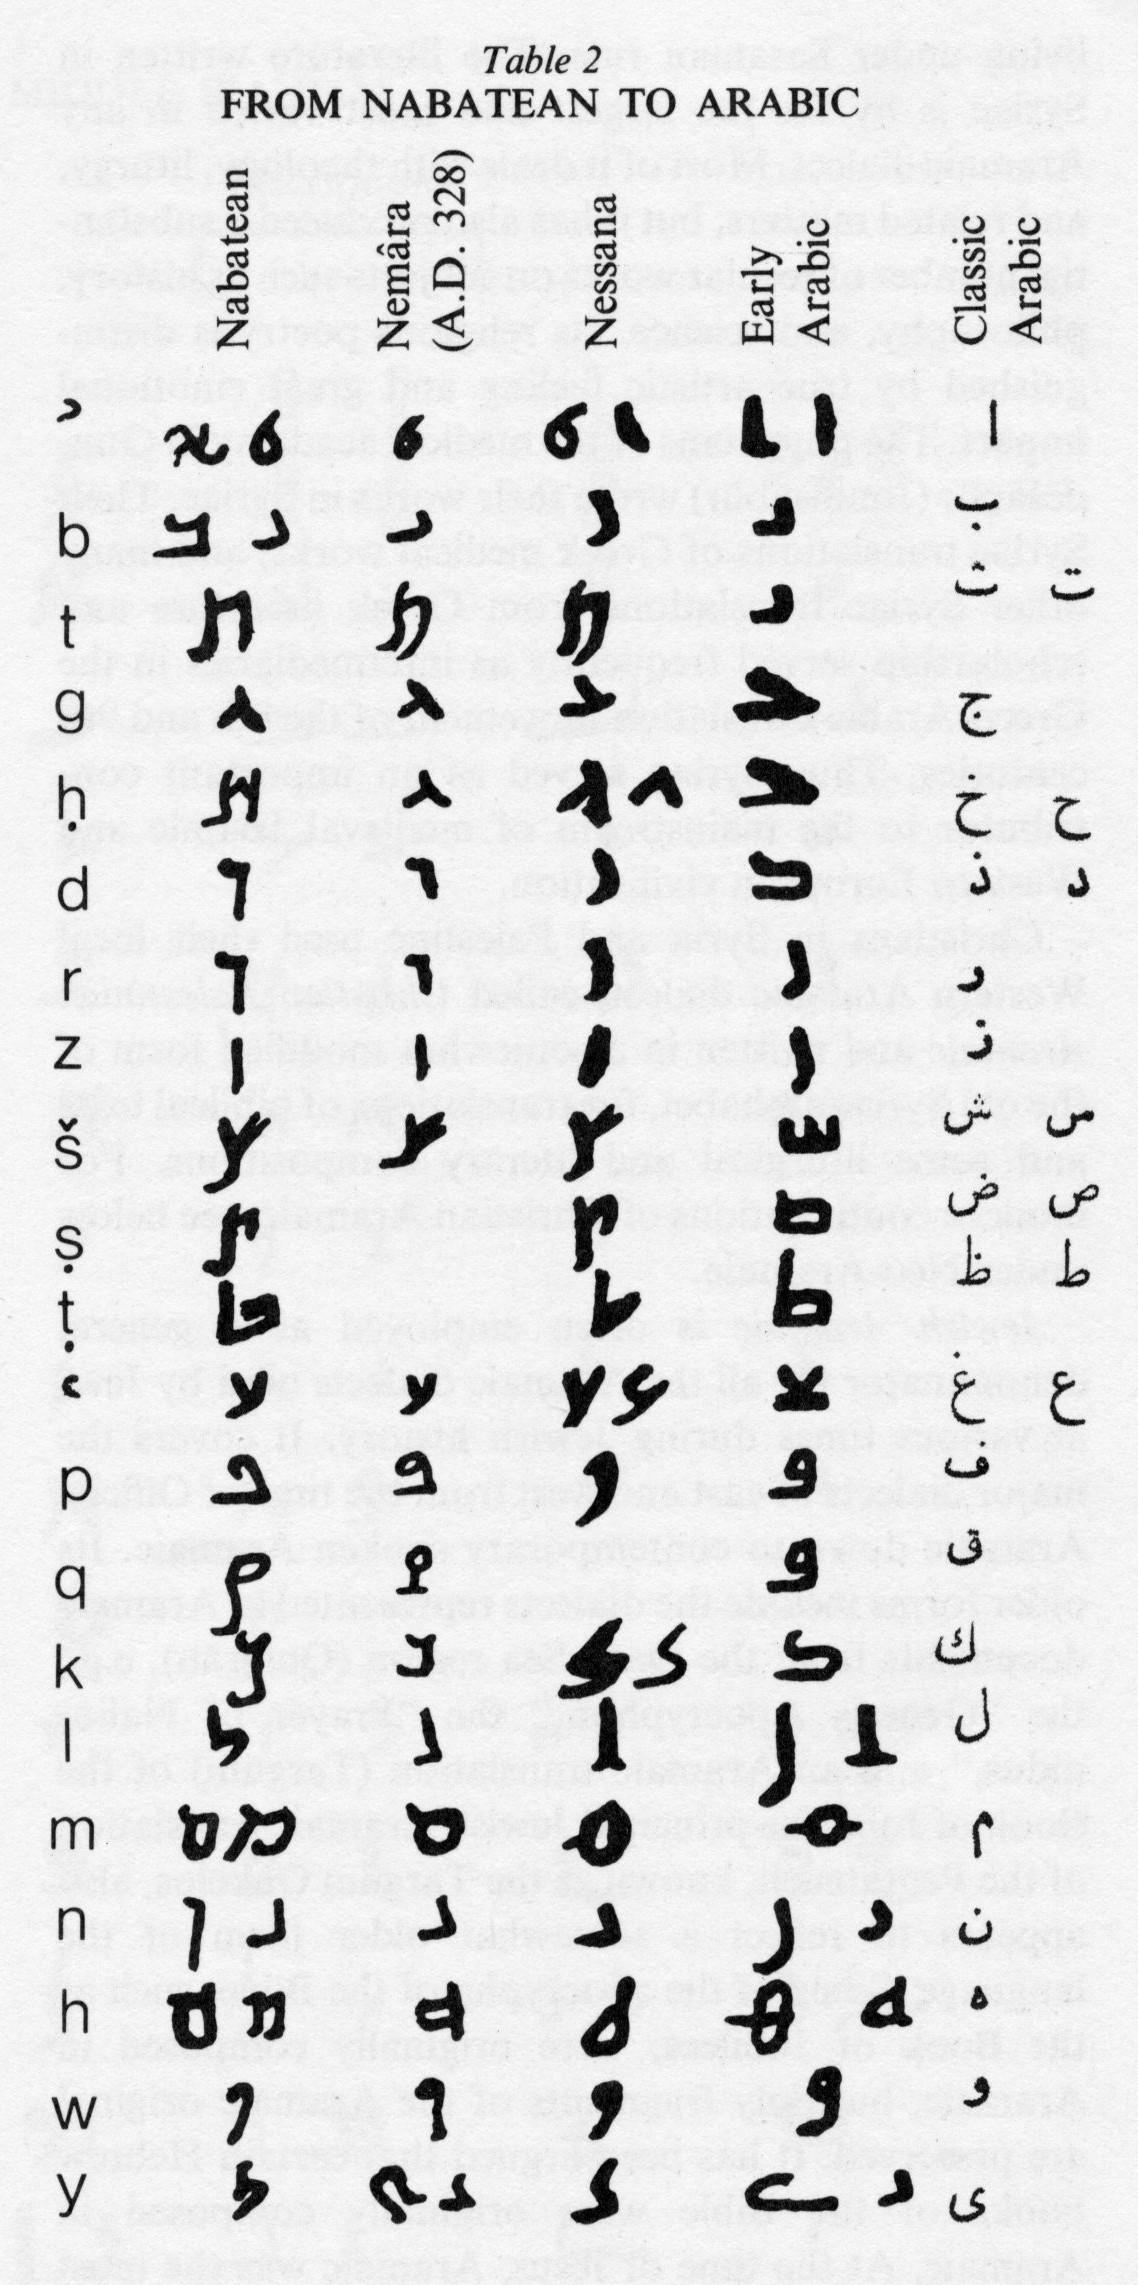 http://www.iranicaonline.org/uploads/files/aramaic_tab2.jpg